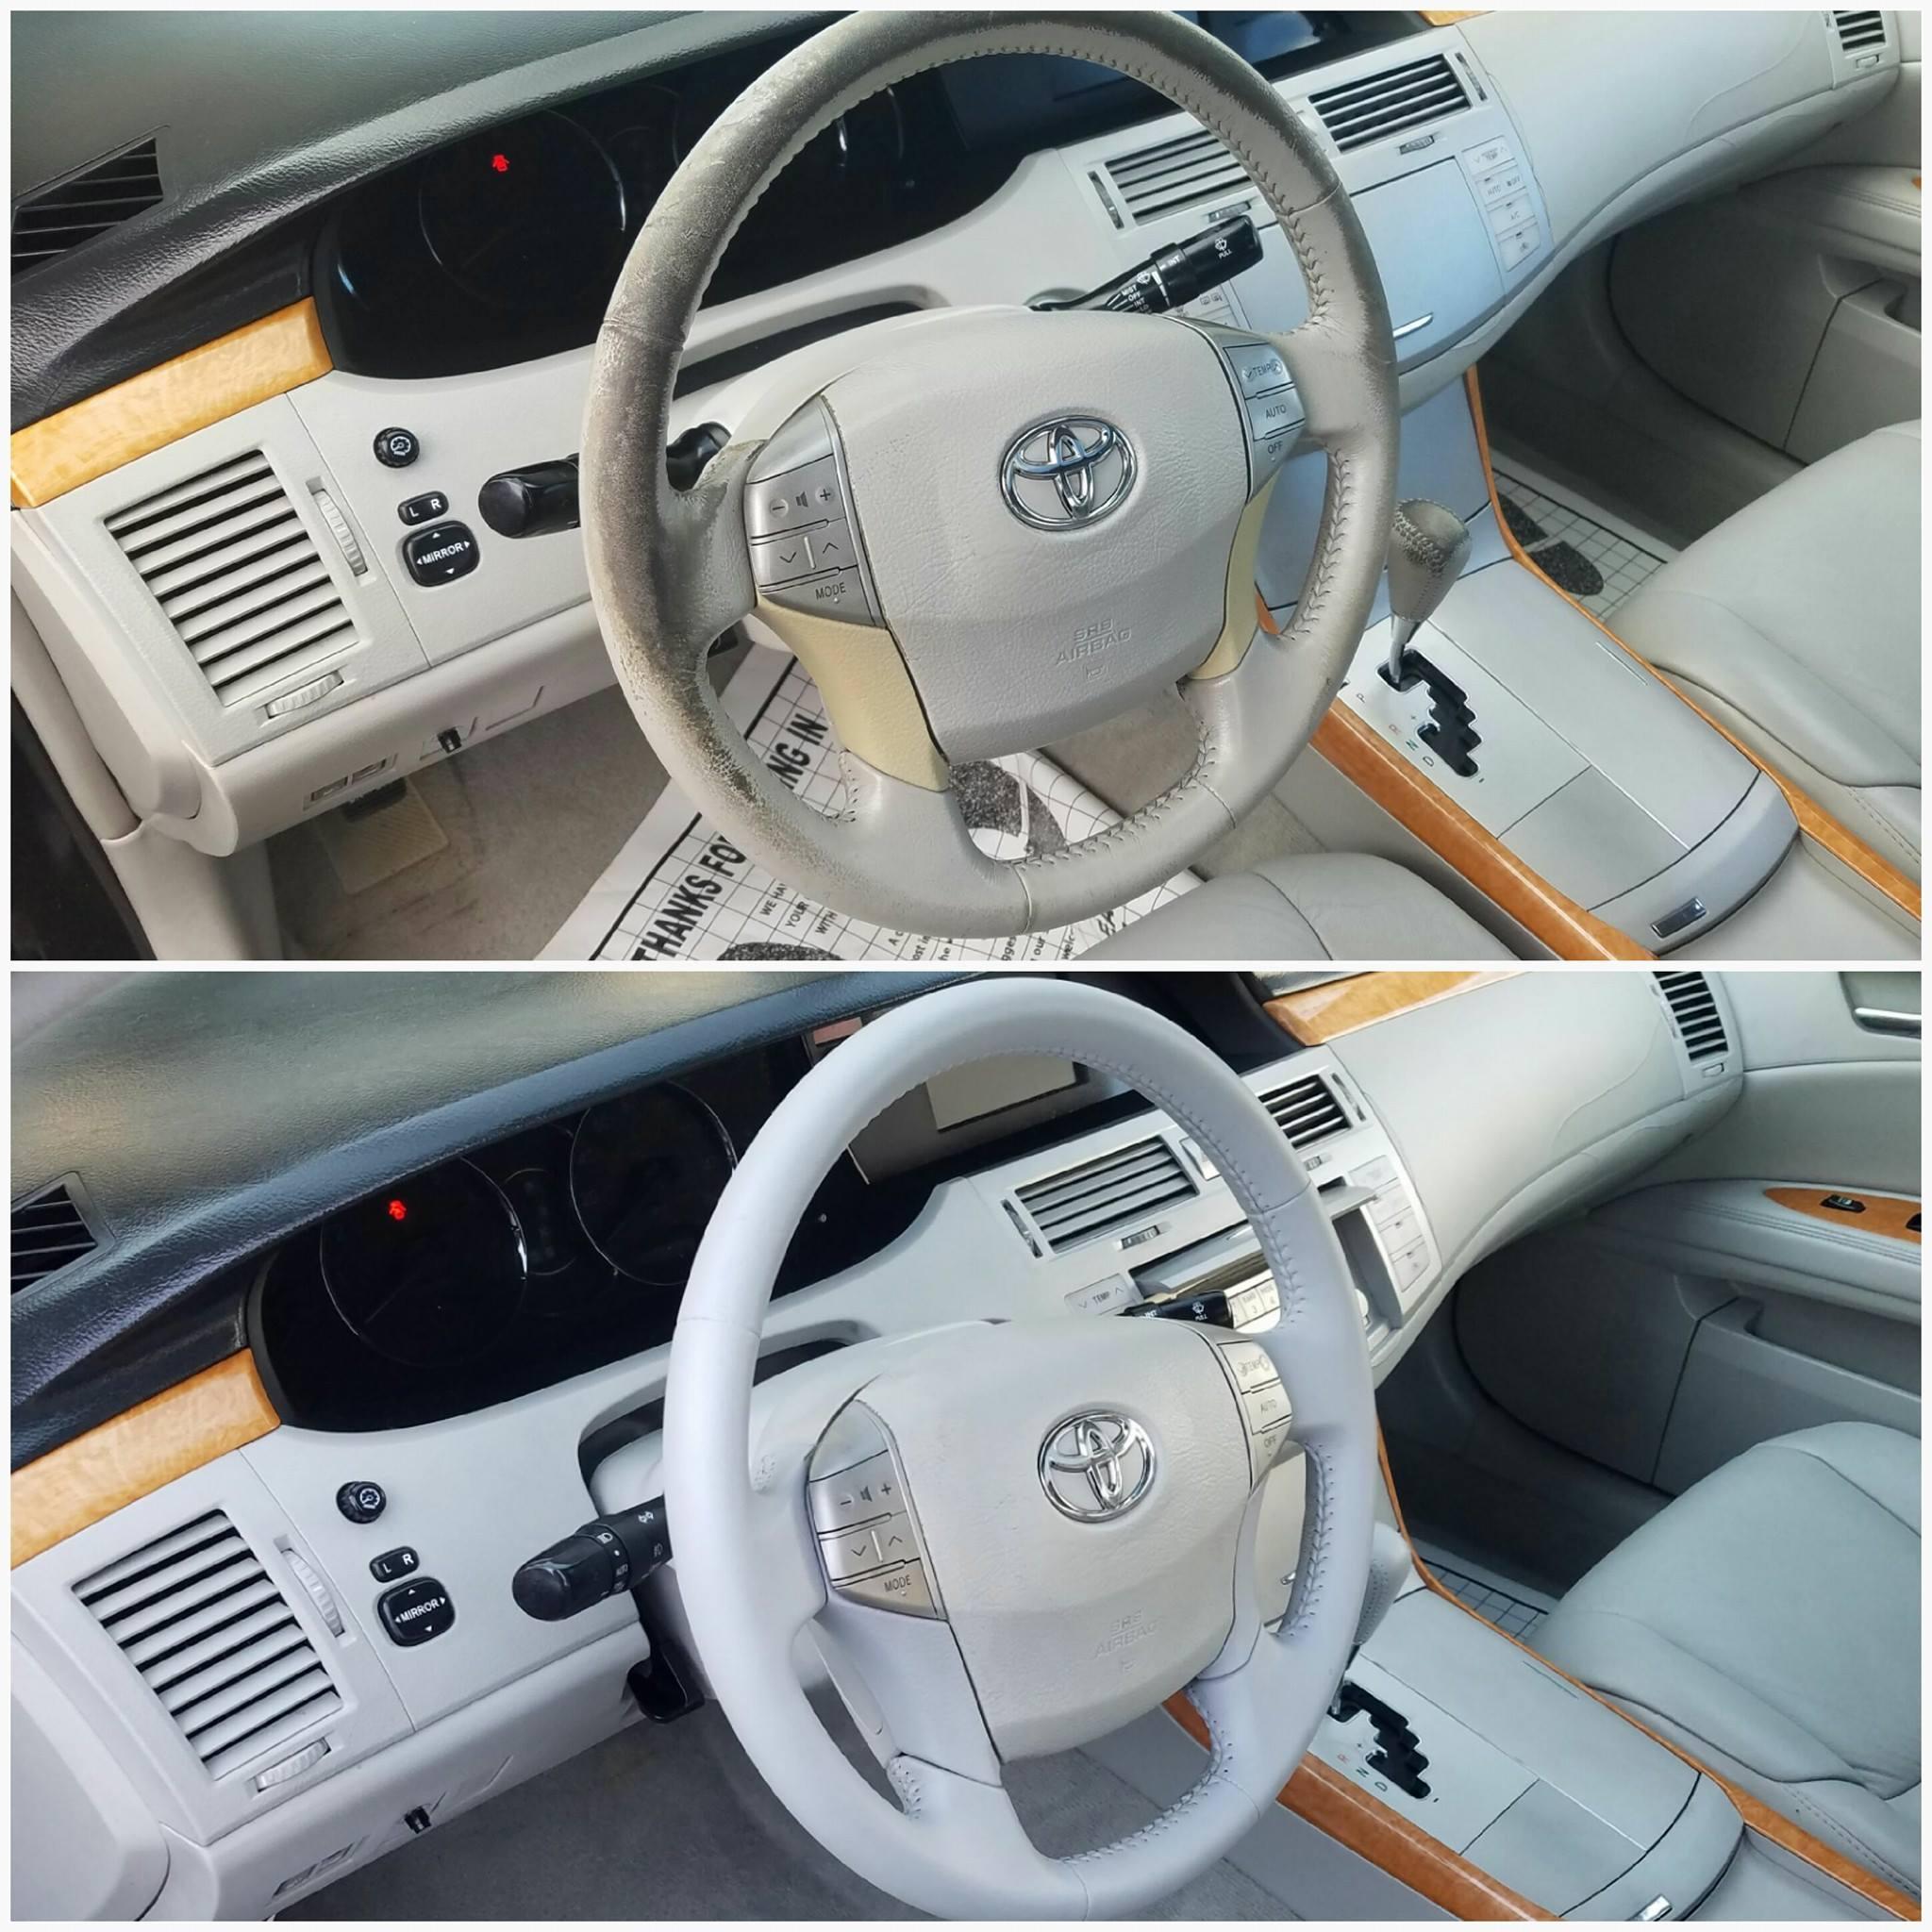 Toyota Avalon Steering Wheel Restoration.jpg